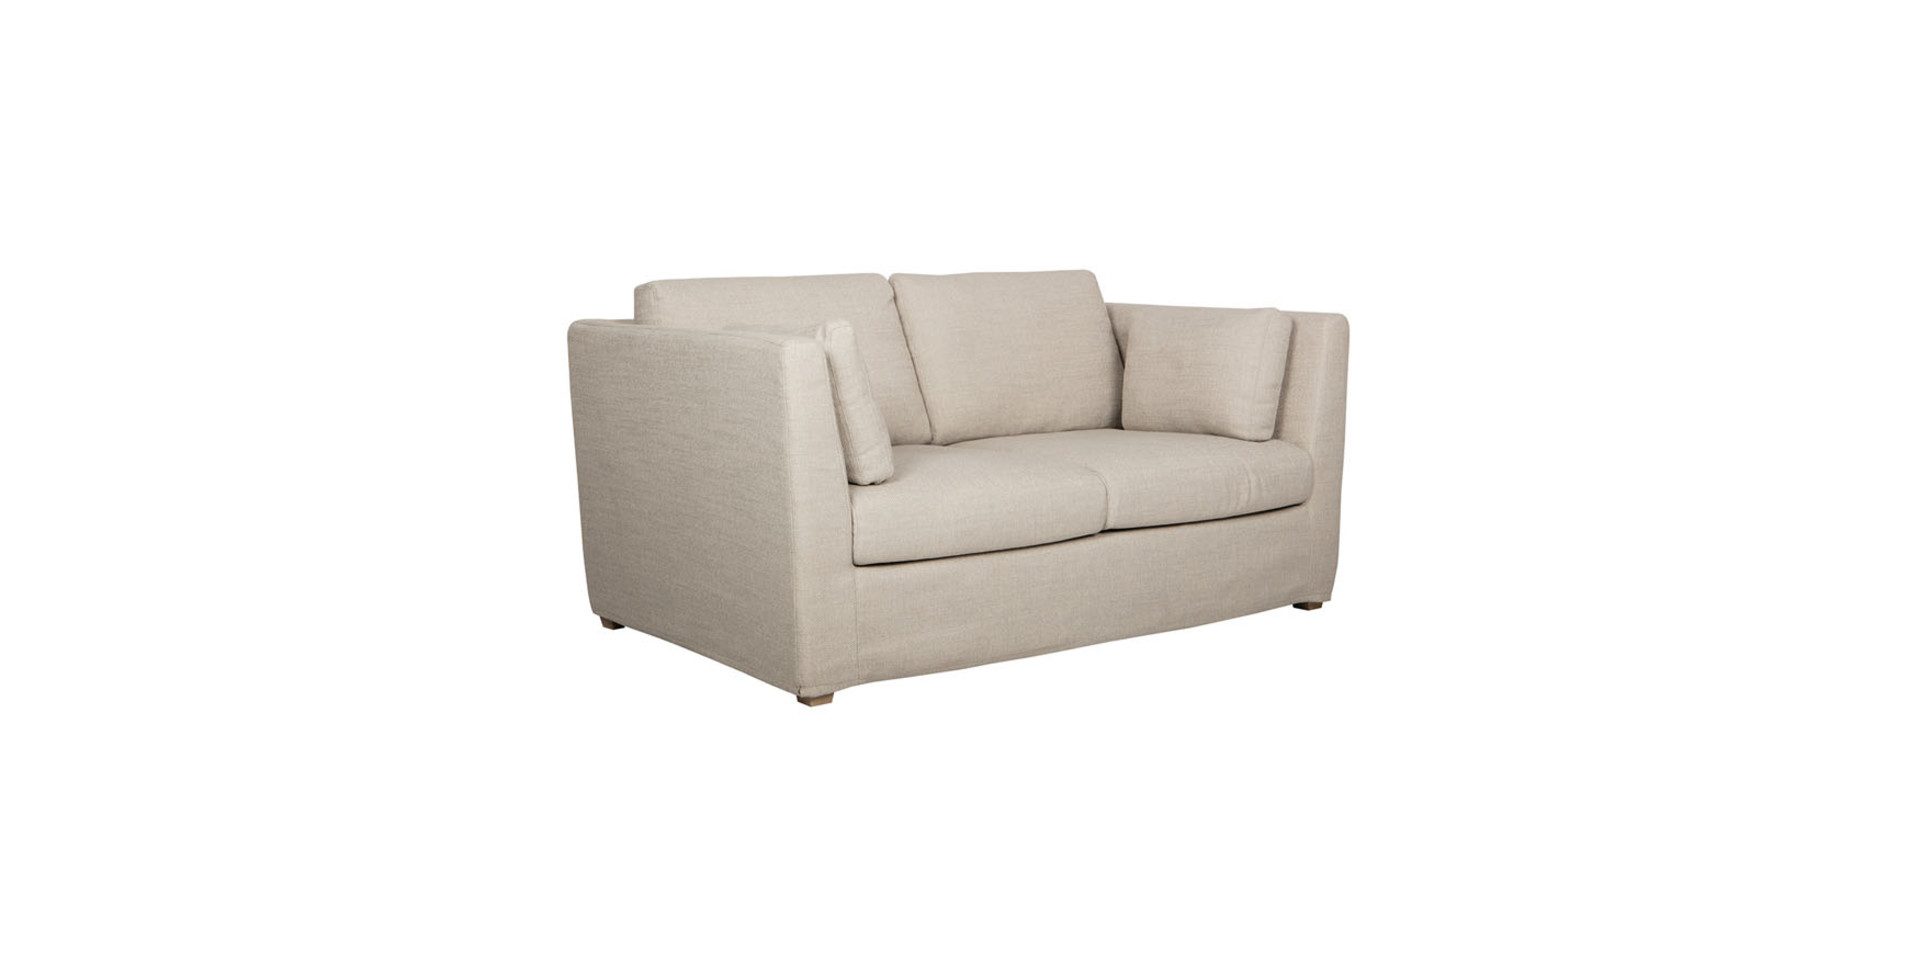 sits-ola-canape-2seater_bermuda1_grey_beige_2